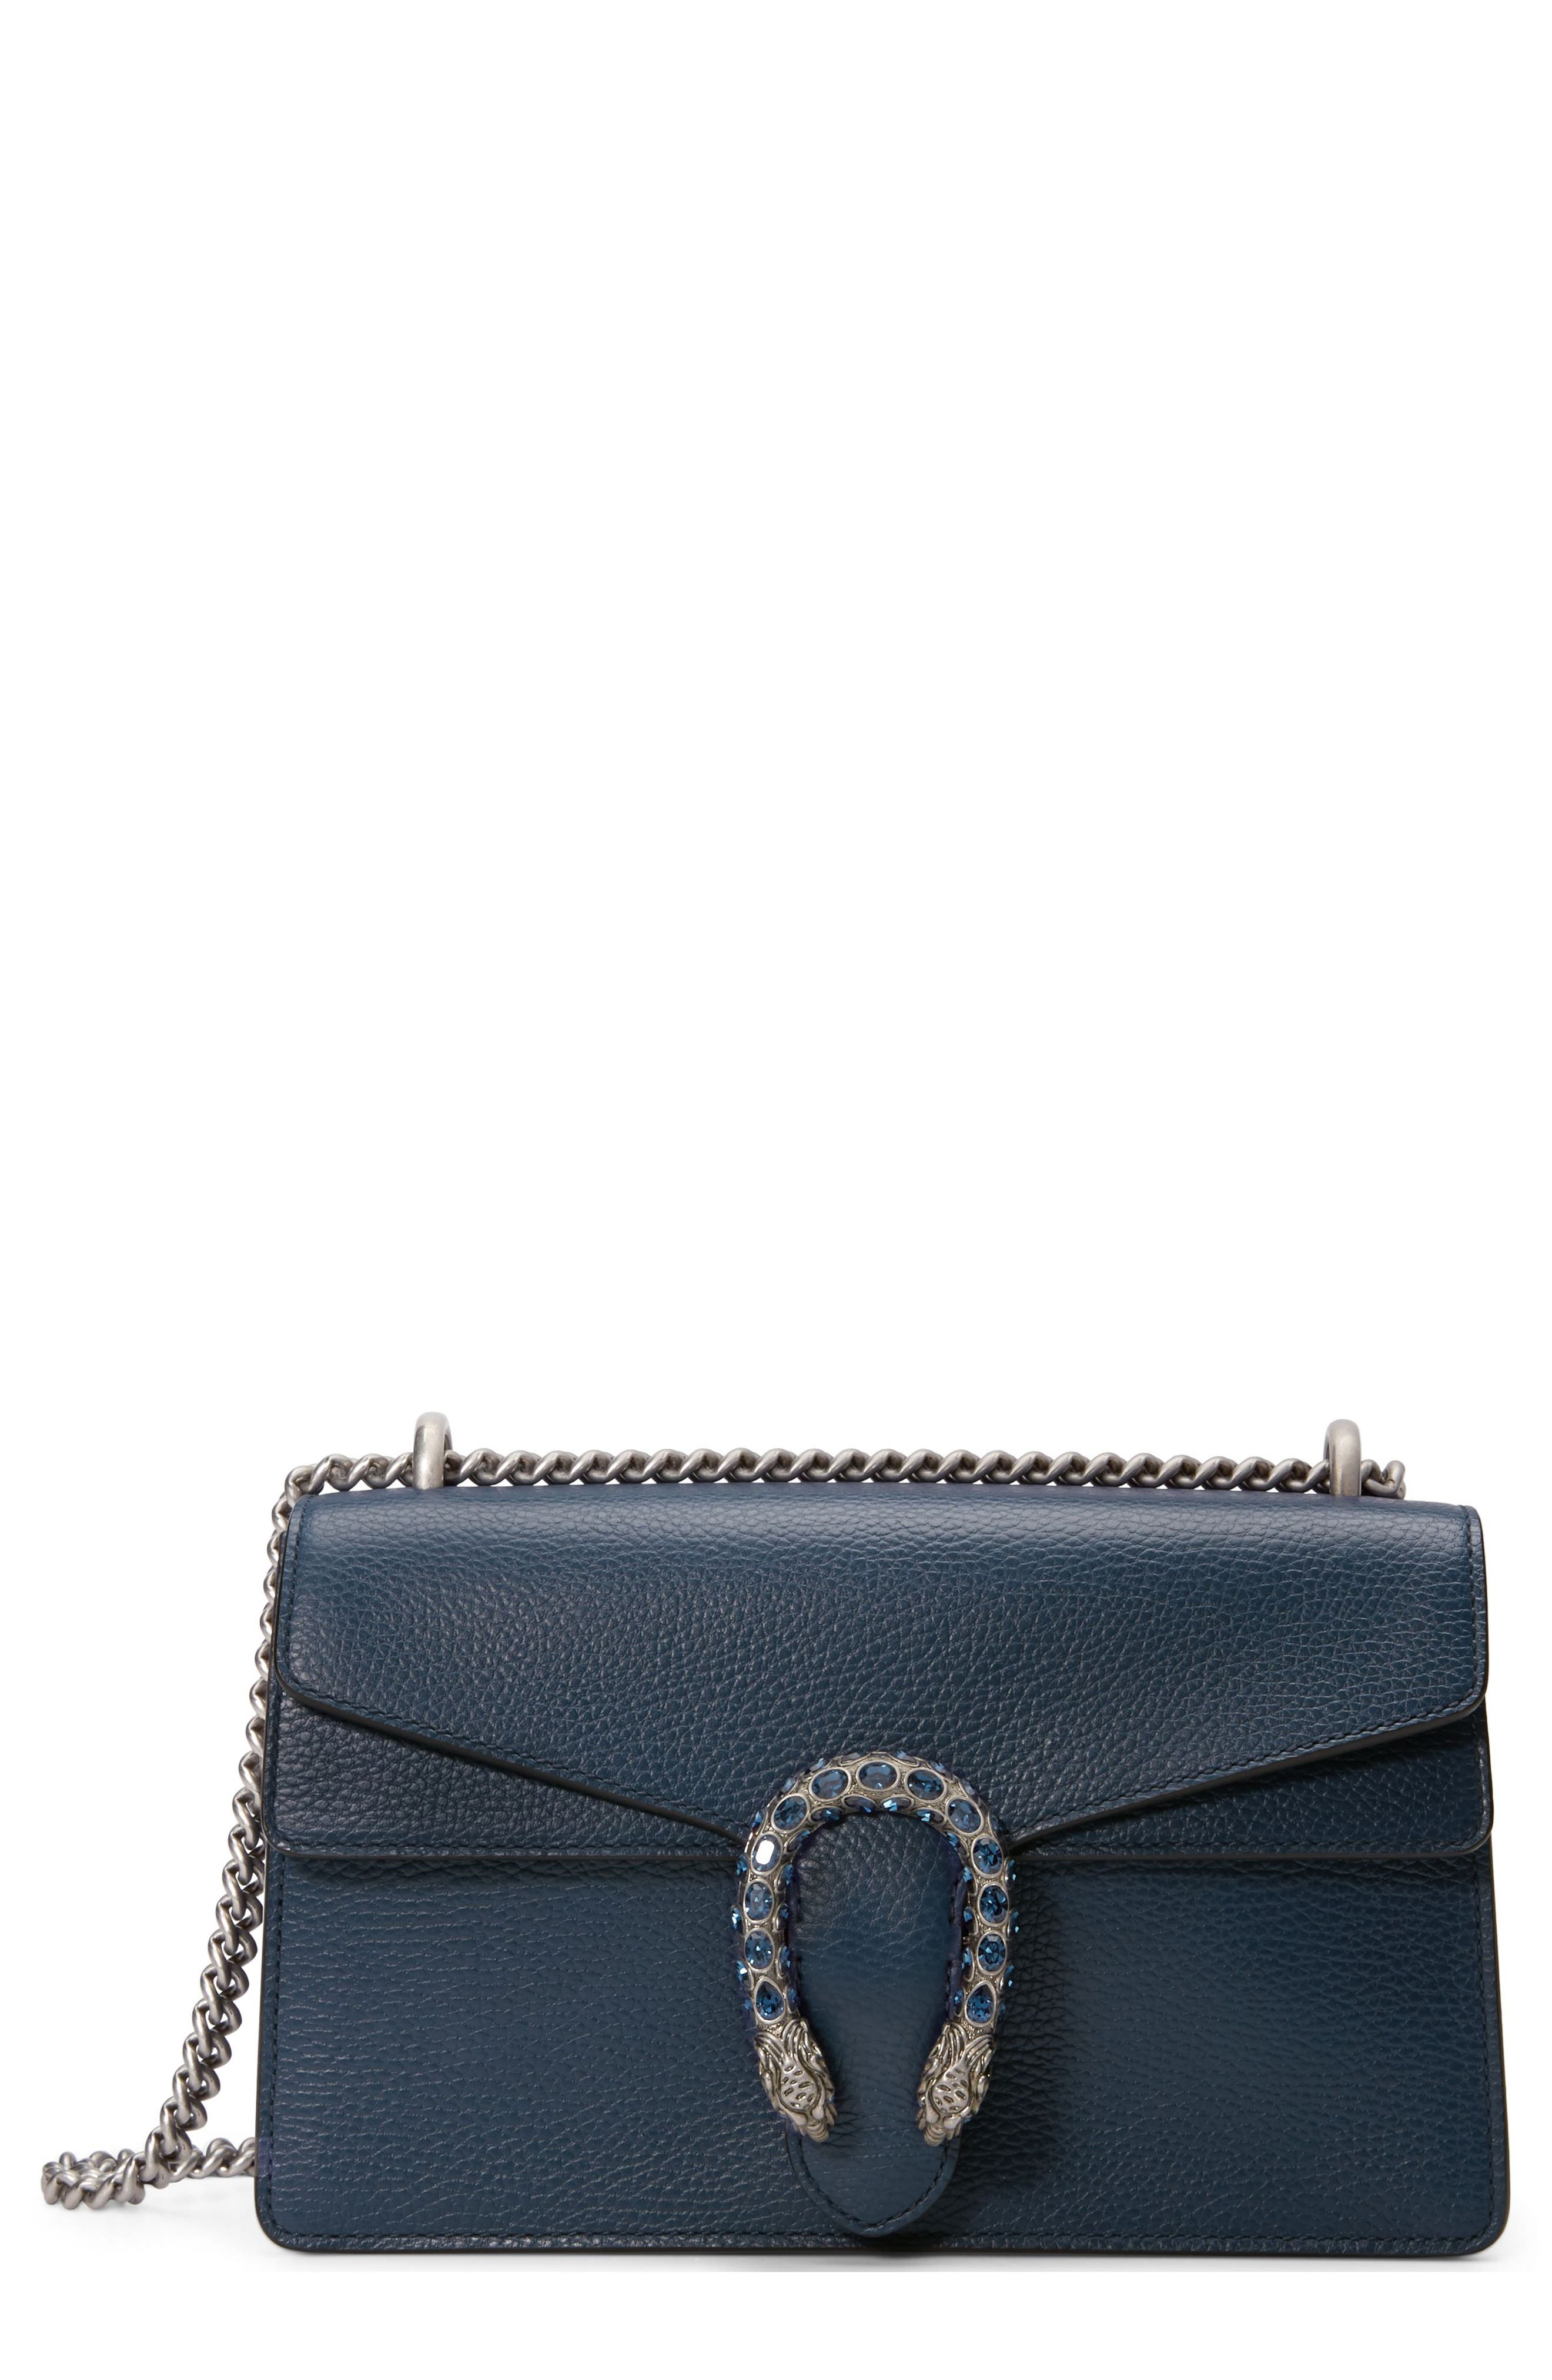 GUCCI, Small Dionysus Leather Shoulder Bag, Main thumbnail 1, color, BLU AGATA/ MONTANA